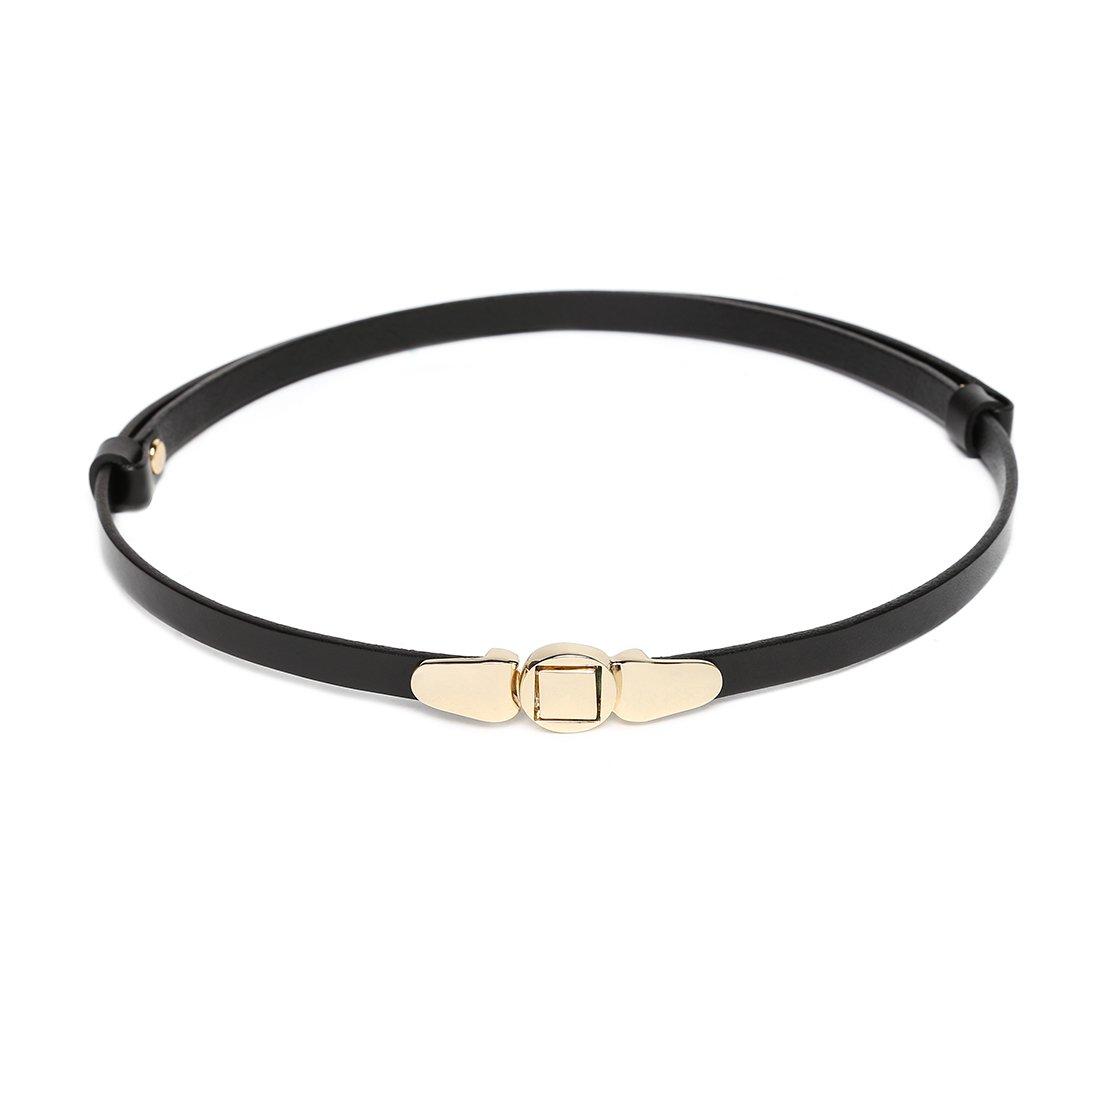 Women's Genuine Cowhide Leather Stylish Thin Dress Belt Adjustable Casual Skinny Belts for Pants Summer Black